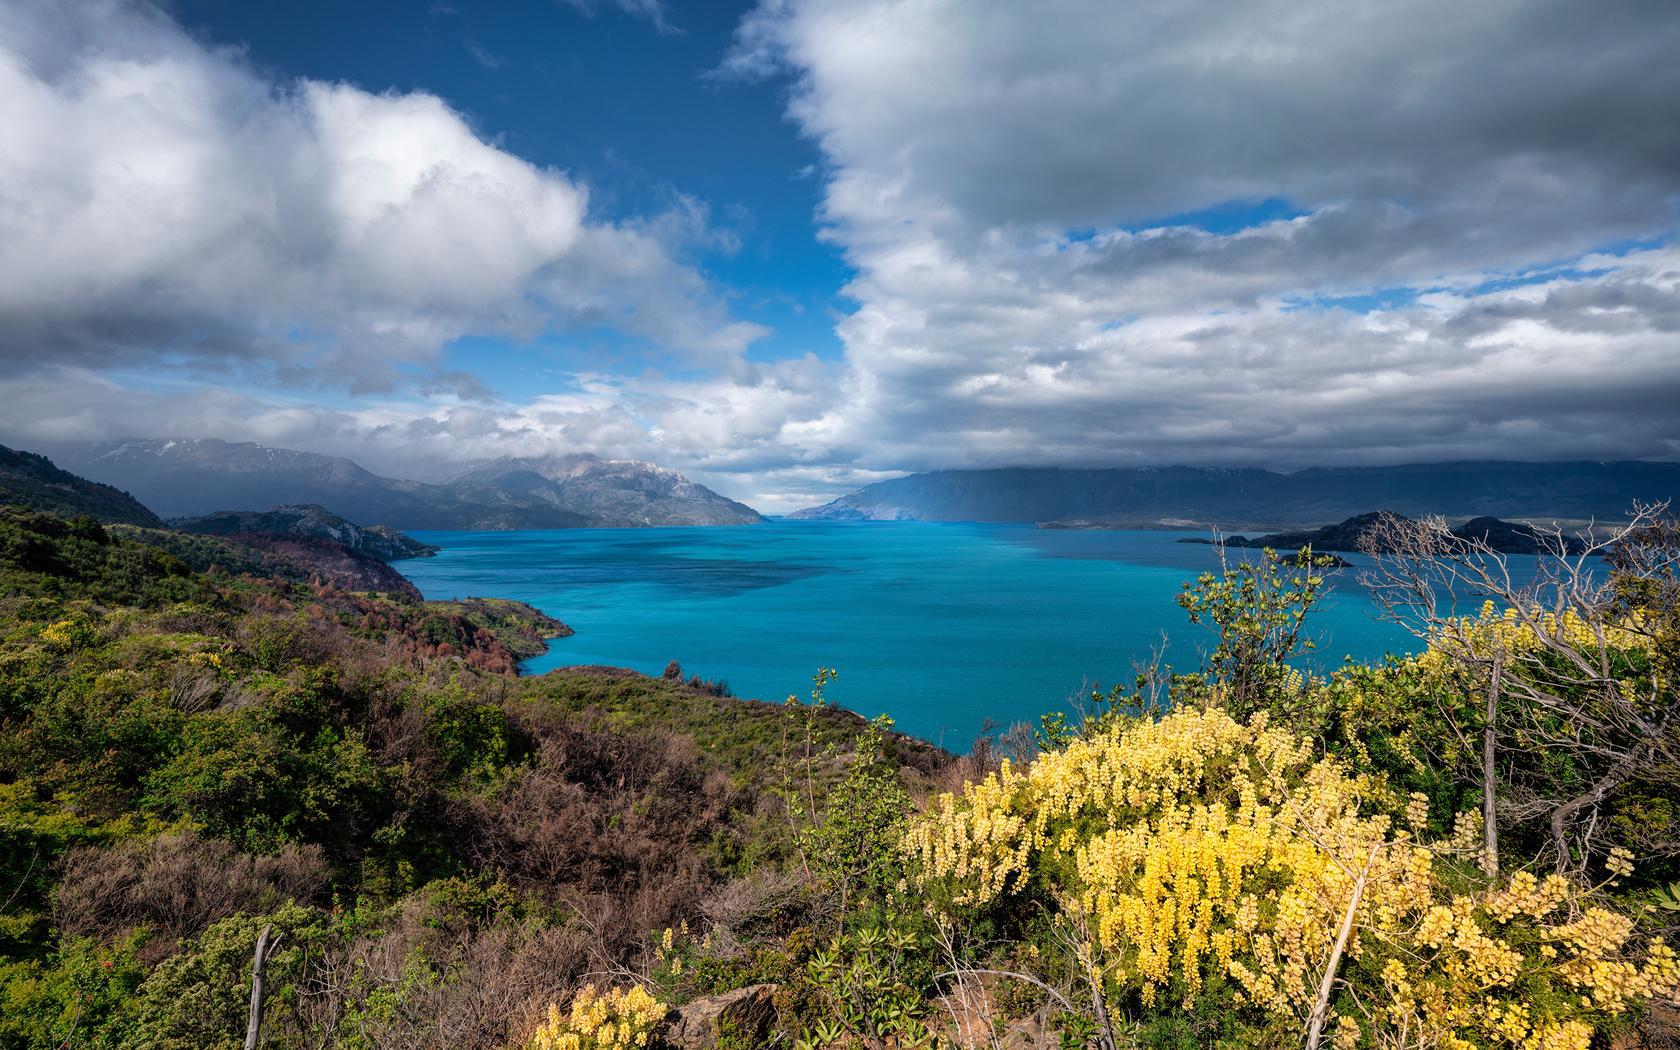 Чили, горы, озеро, lago, gral, carrera, облака, природа